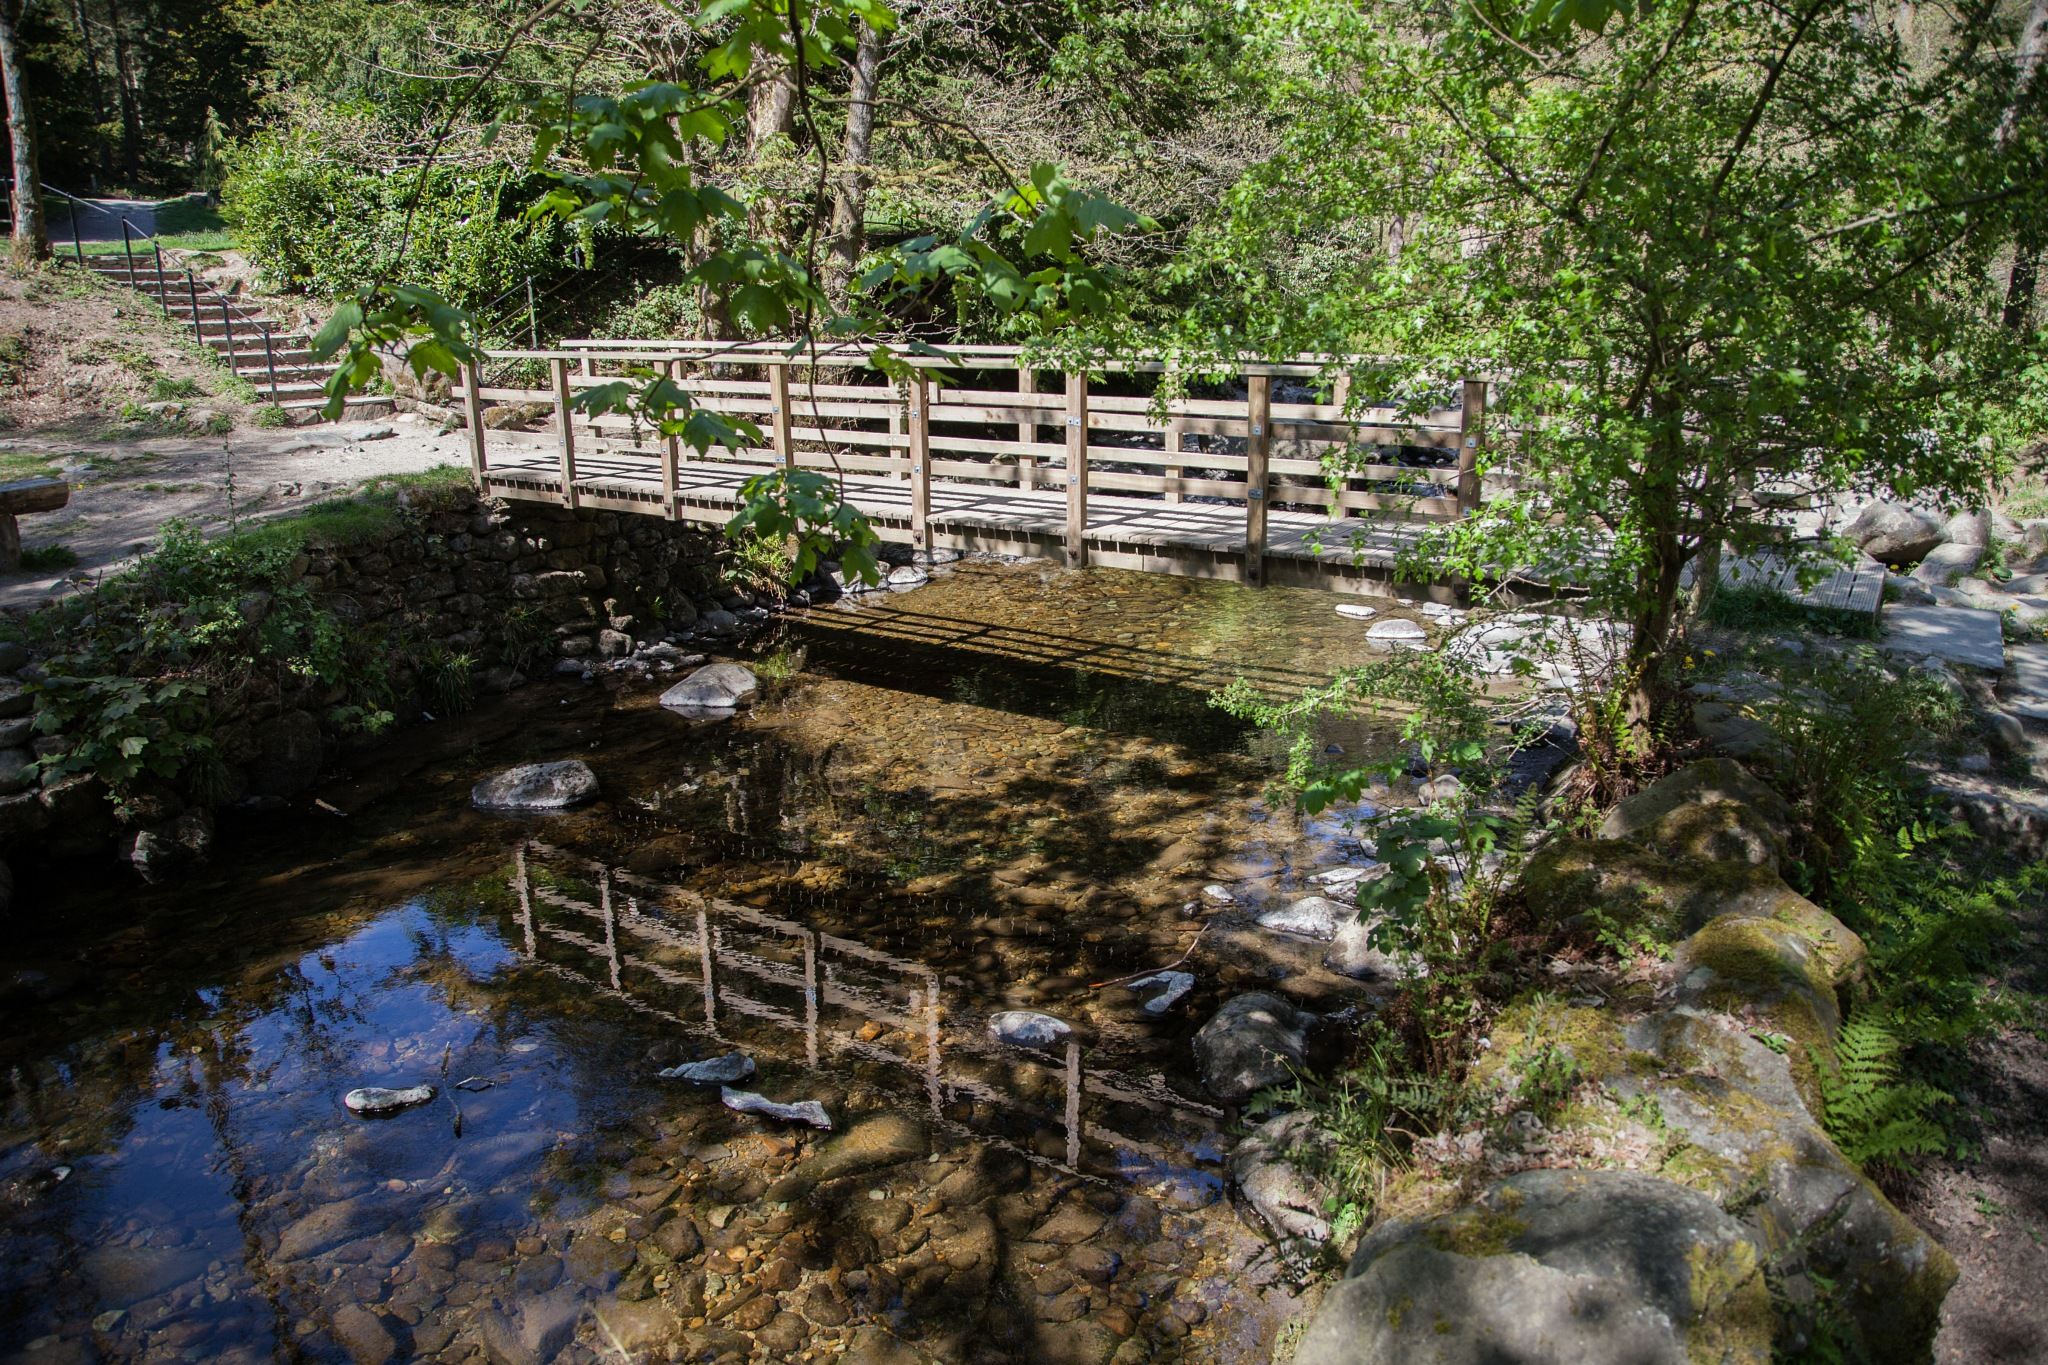 3 bridges by Dave Chennells